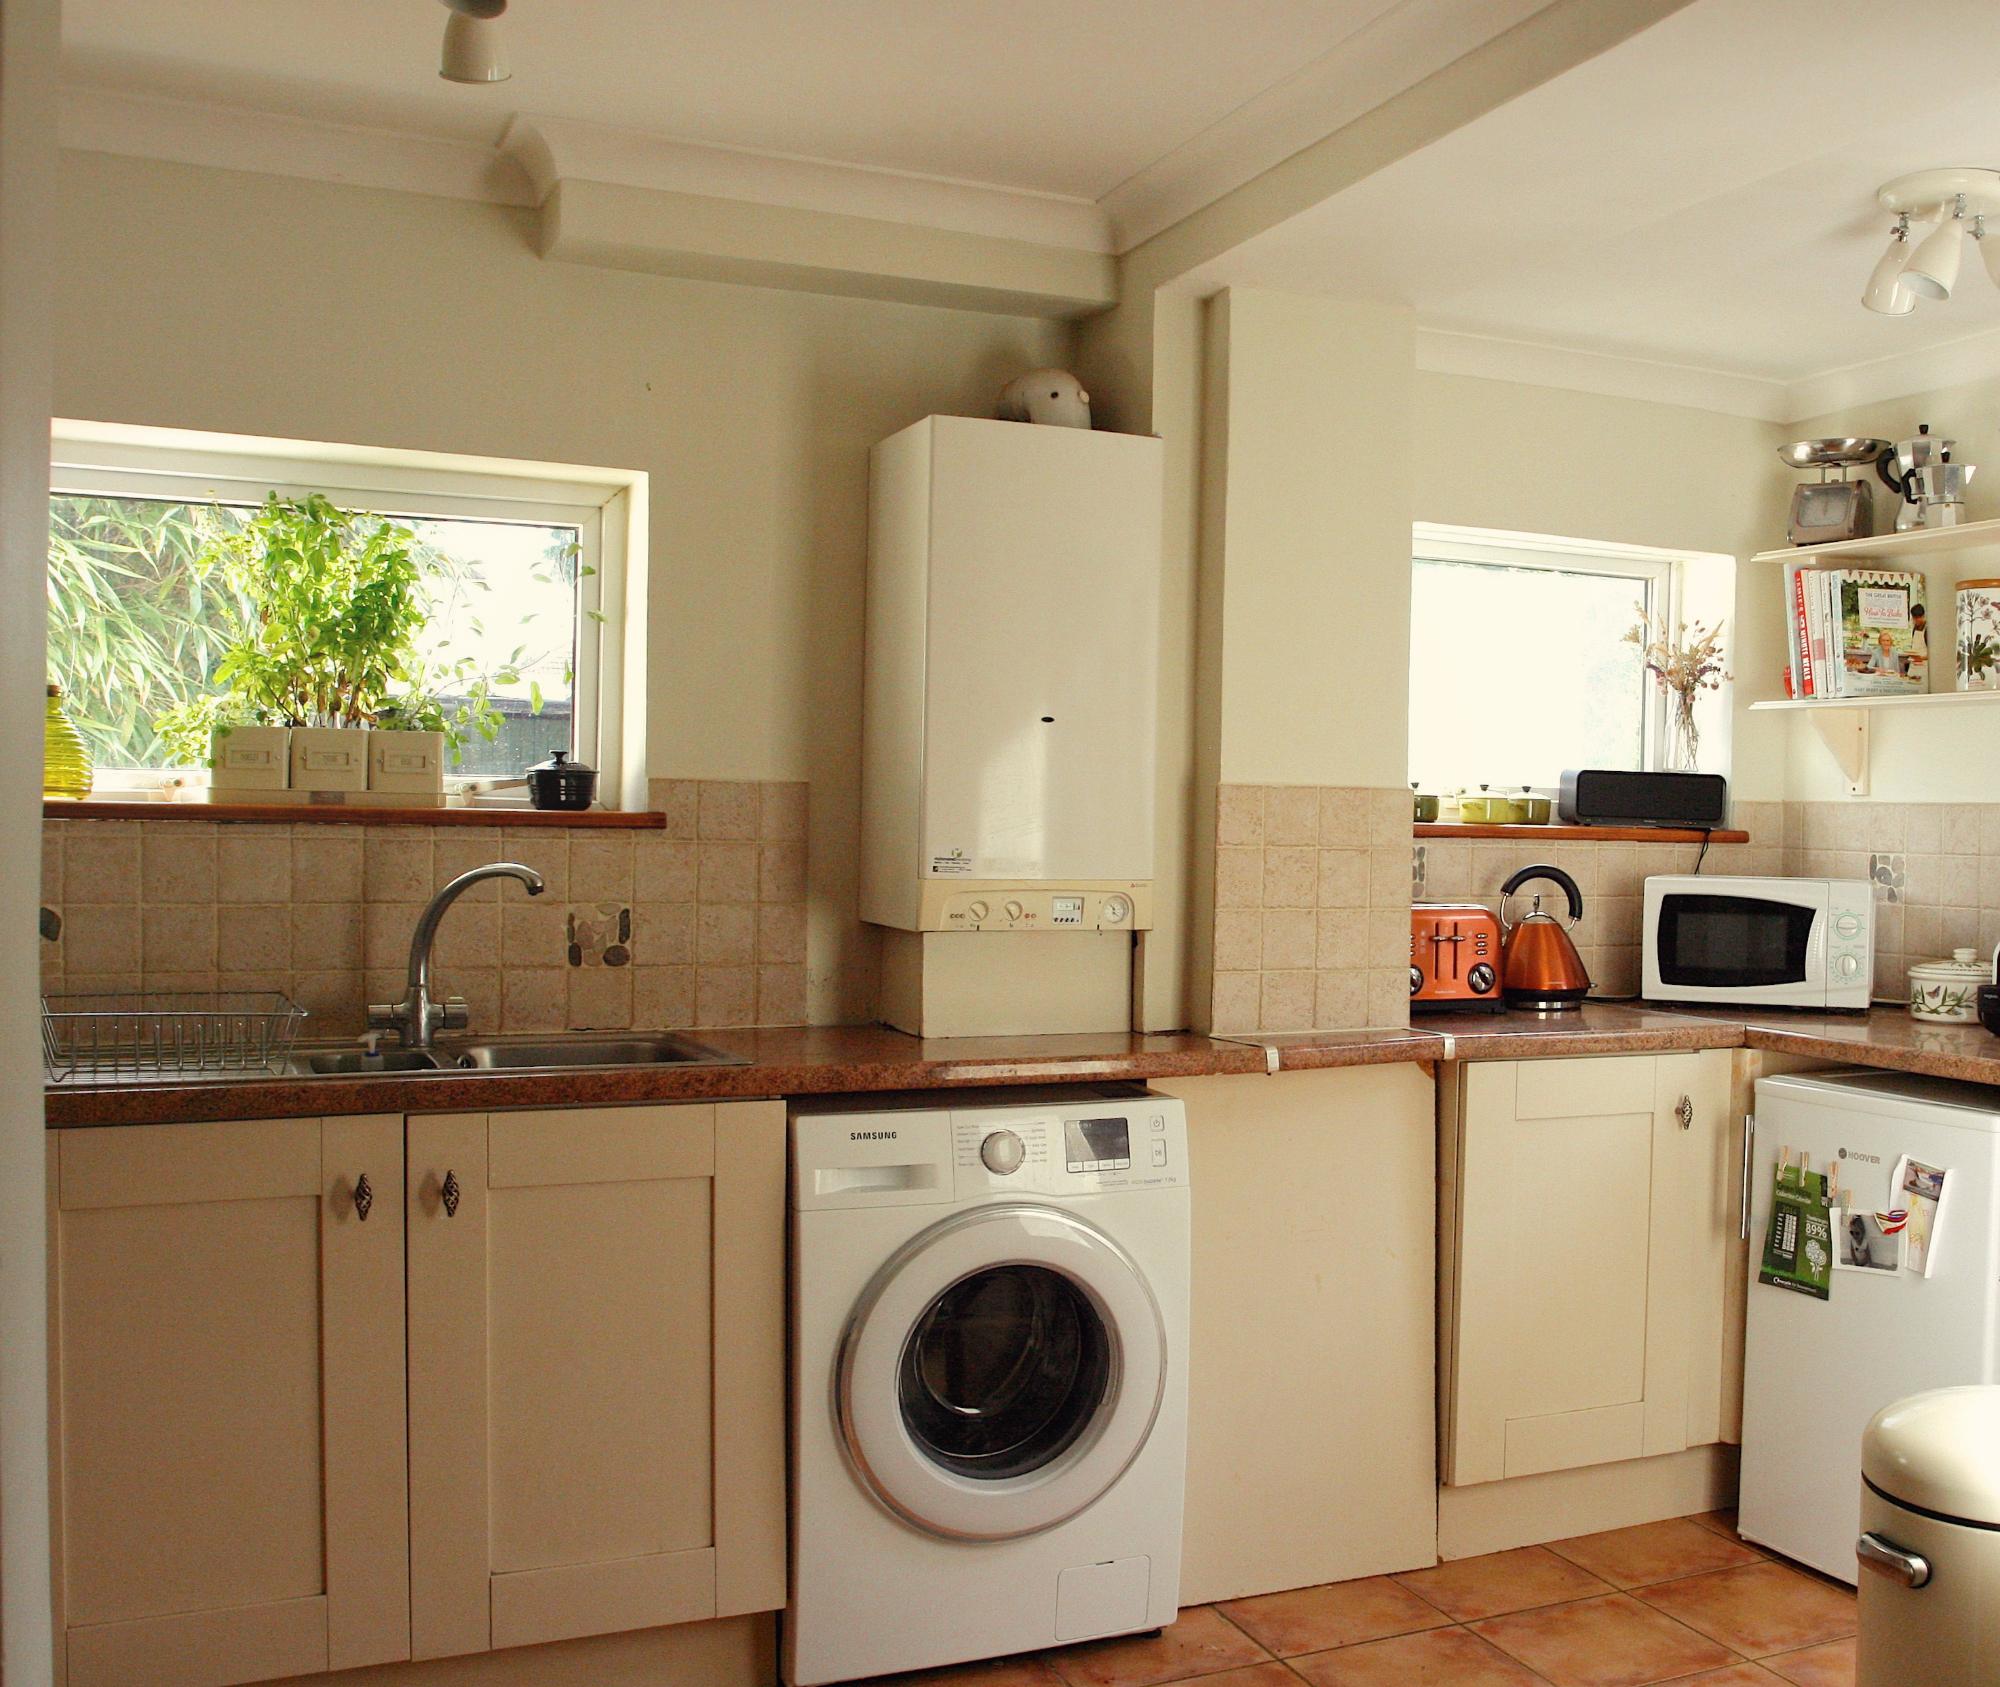 Kitchen Cabinets Wickes: Kitchens Wickes Amazing Luxury Home Design